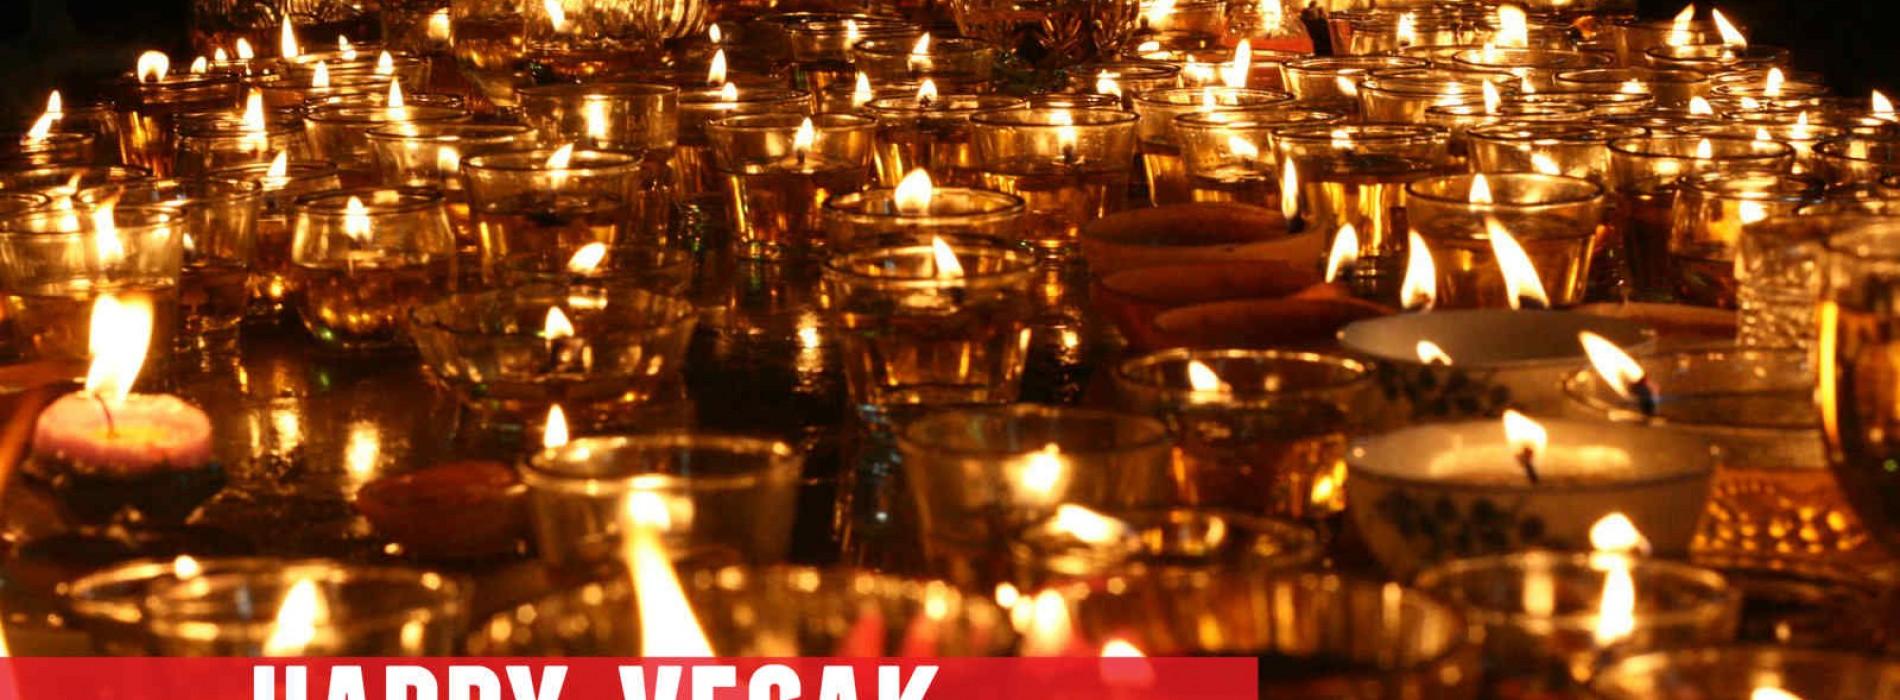 Happy Vesak From Us To You